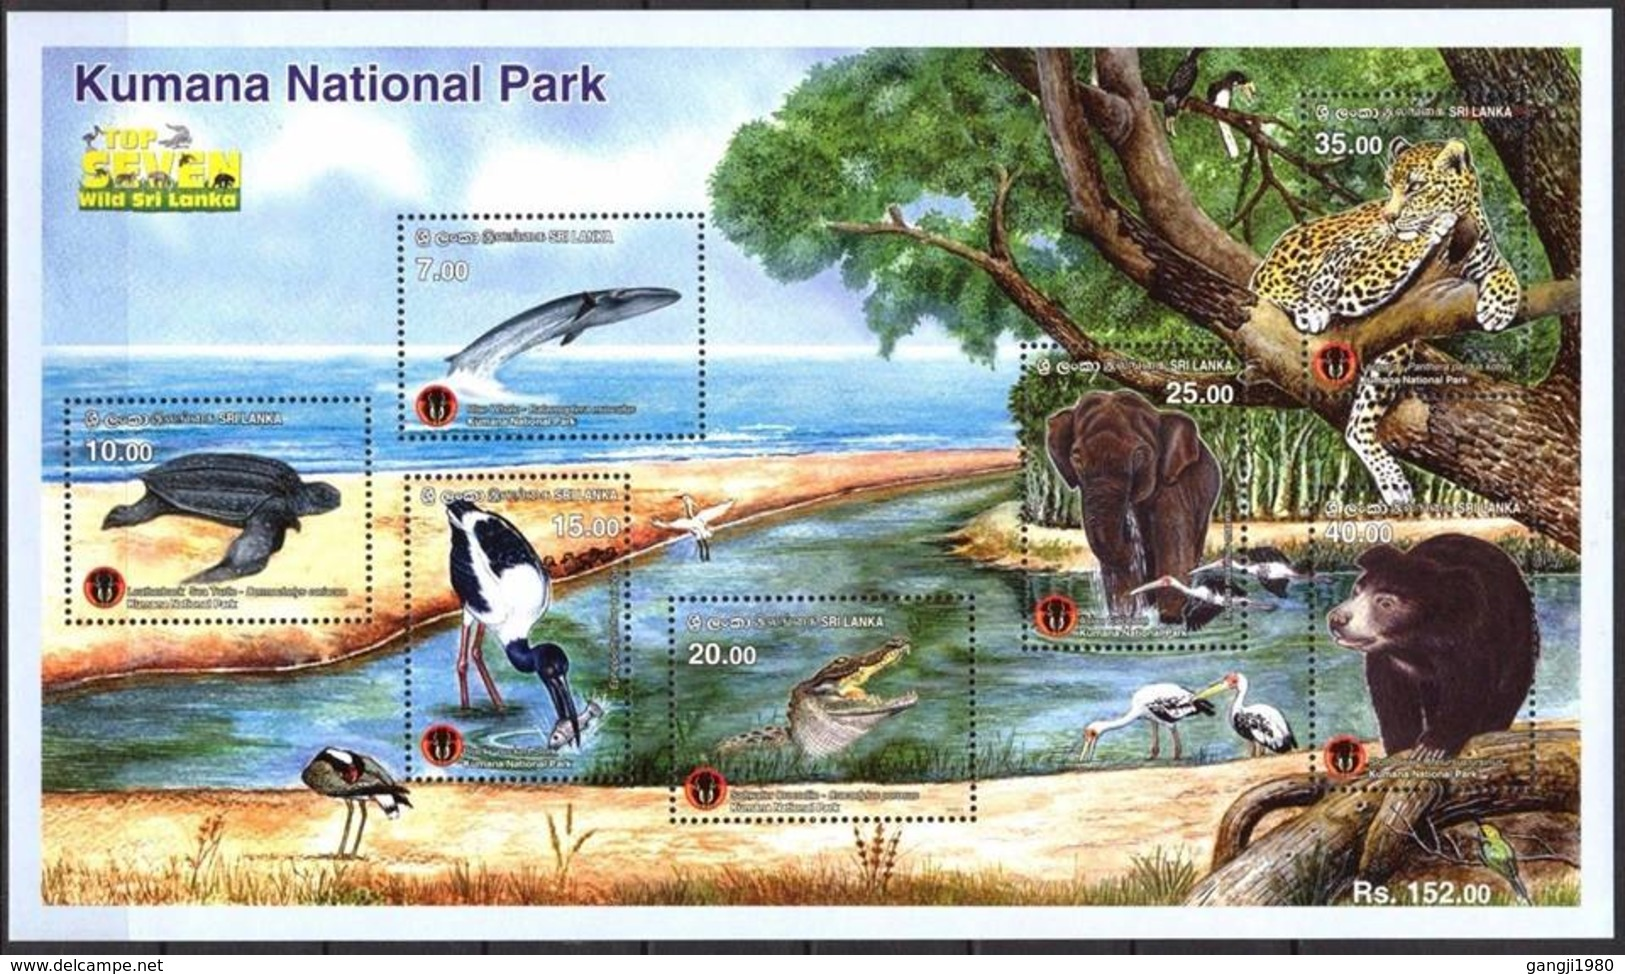 Sri Lanka 2016  Kumana National Park Leopard, Turtles, Birds, Stork Whales, Elephant Miniature Sheet. - Francobolli